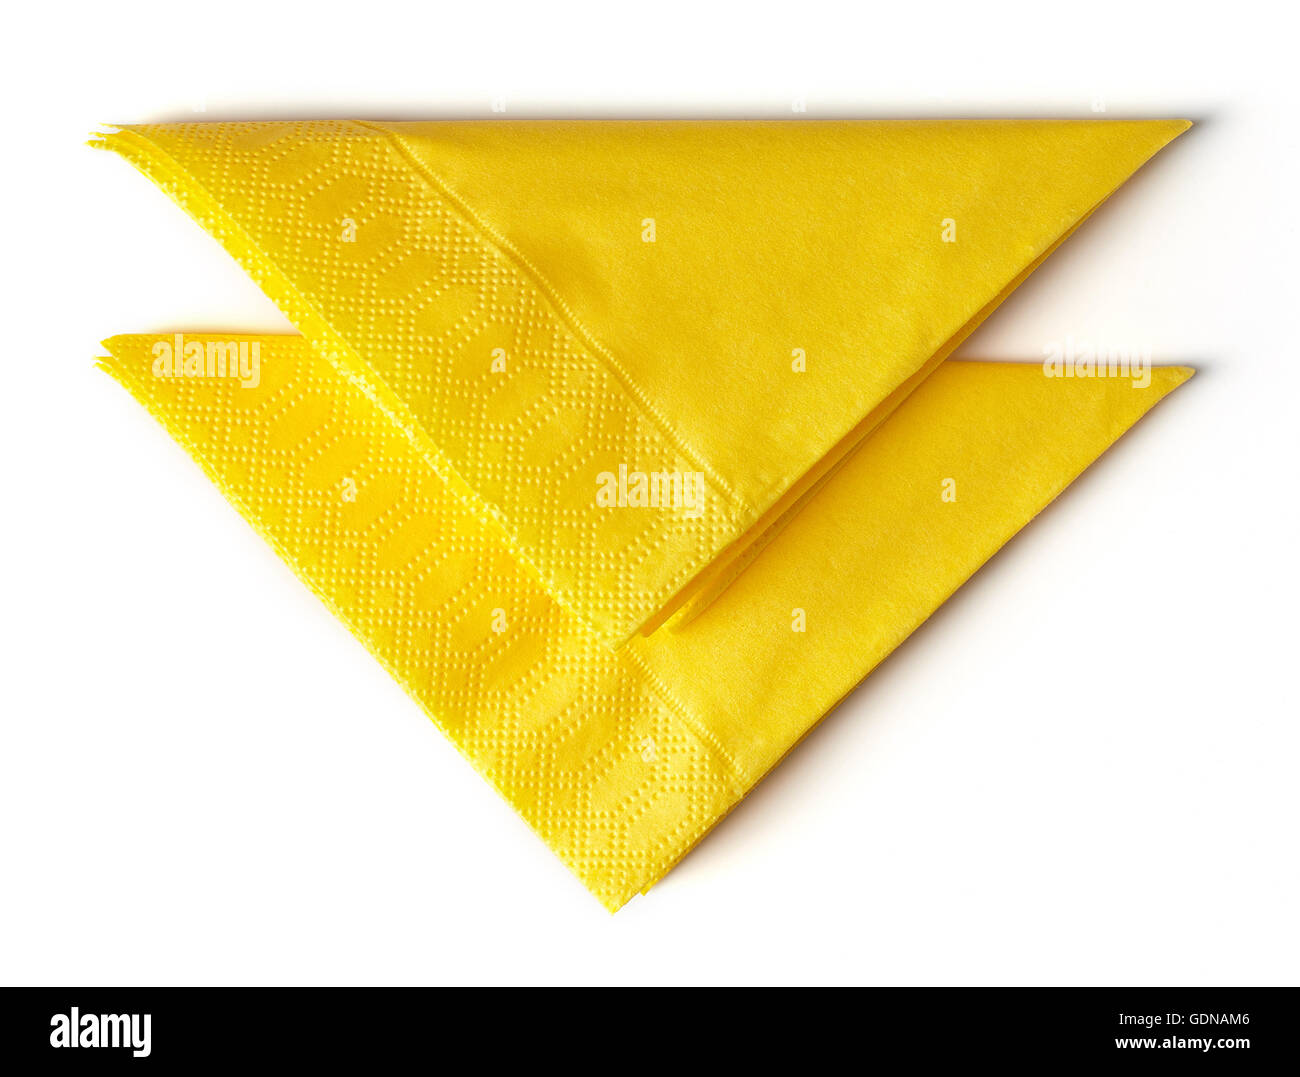 yellow paper napkins isolated on white background - Stock Image